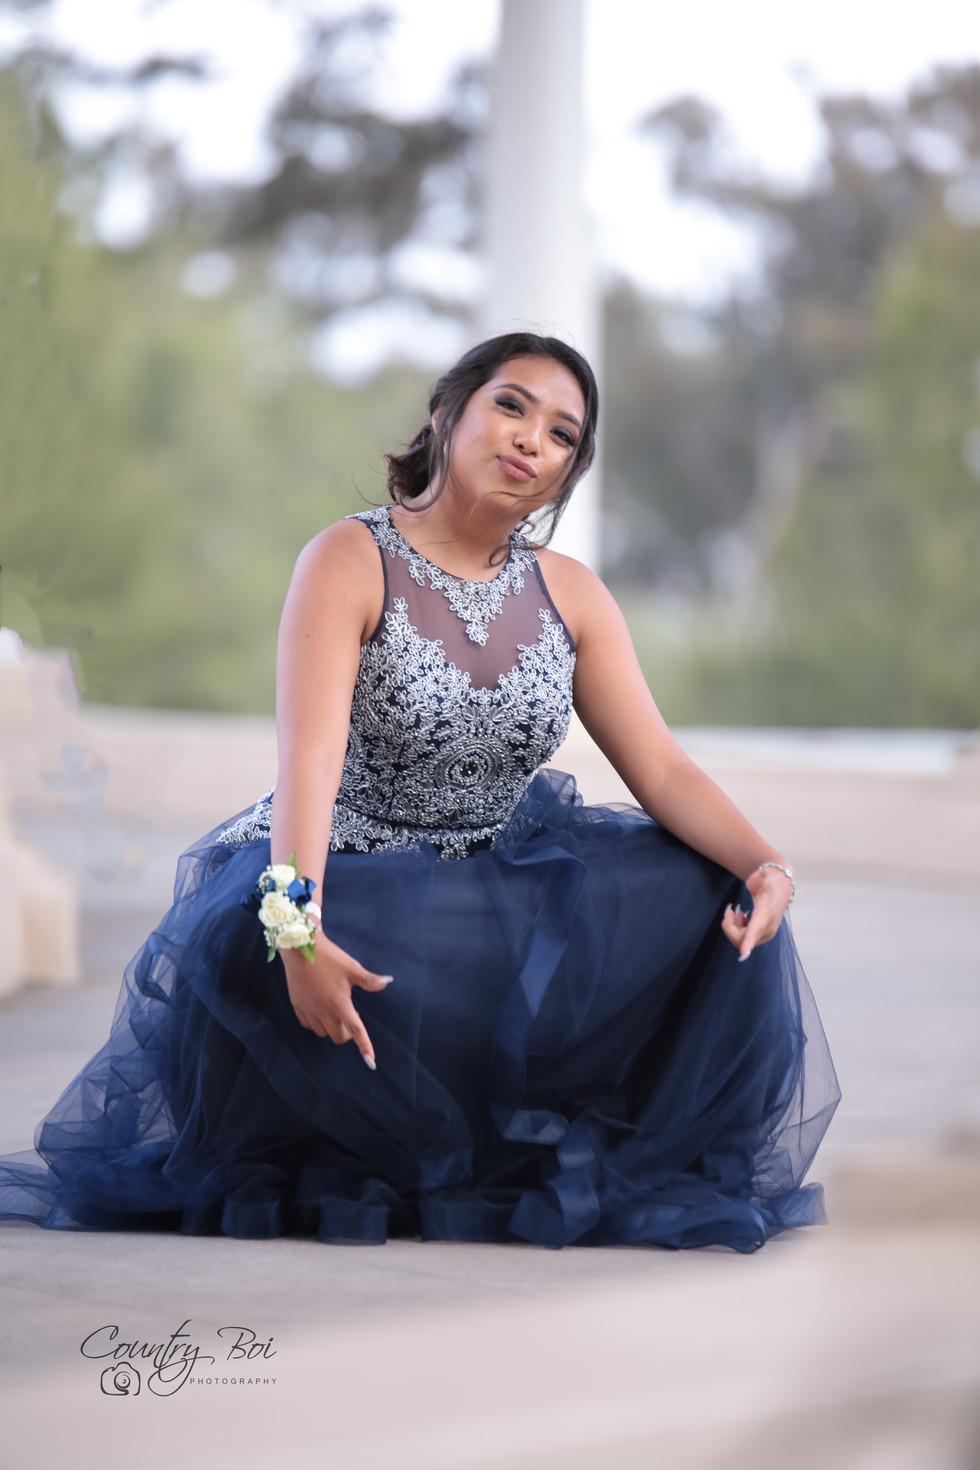 Lady Blue Prom dress at the Prada  in Balboa downtown San Diego Ca Ridgecrest Countryboiphotography.com